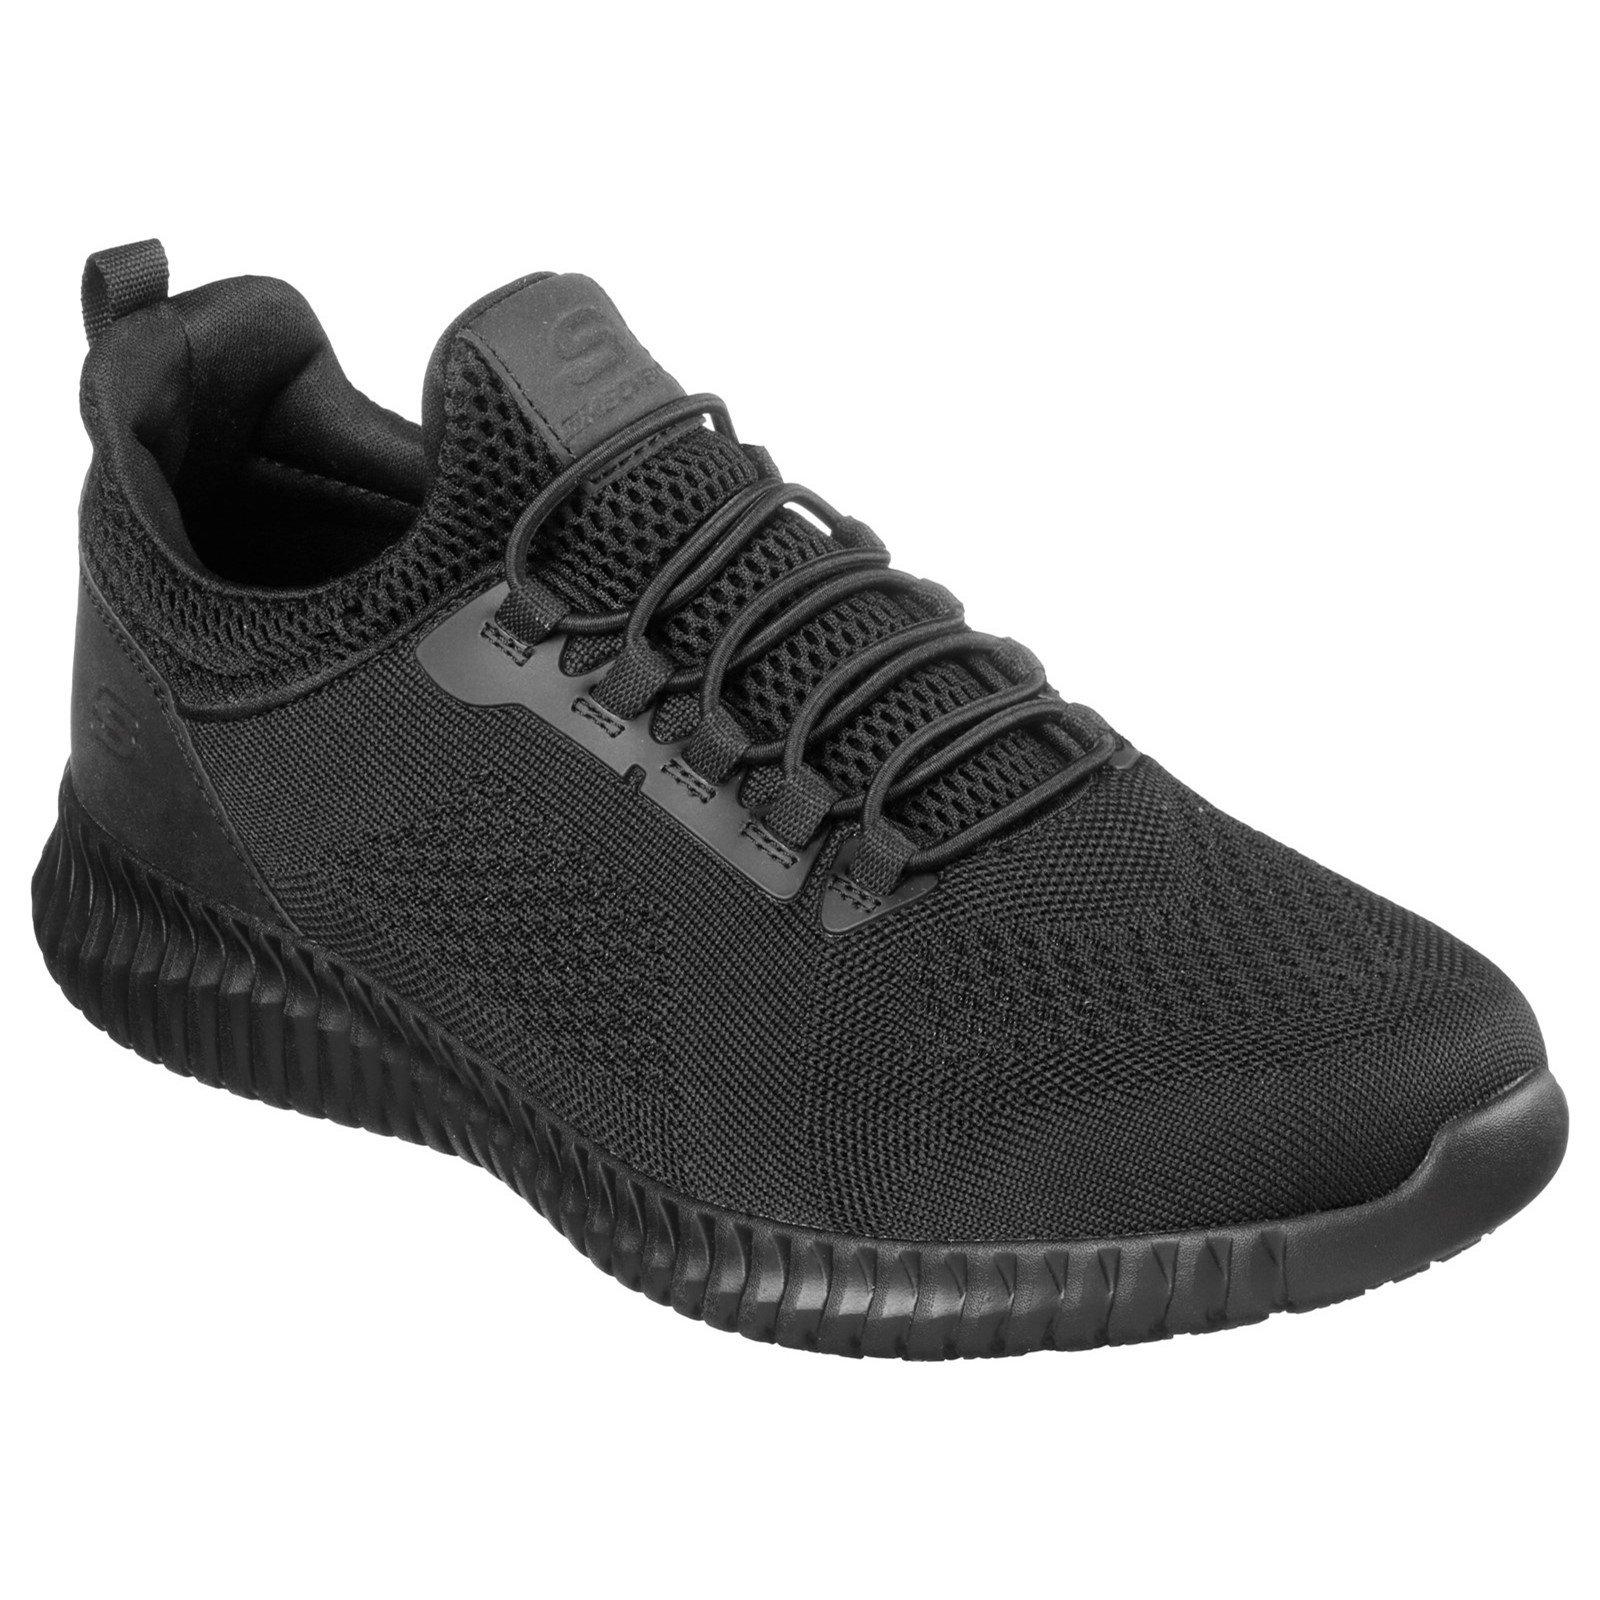 Skechers Unisex Cessnock Trainer Black 32620 - Black 6